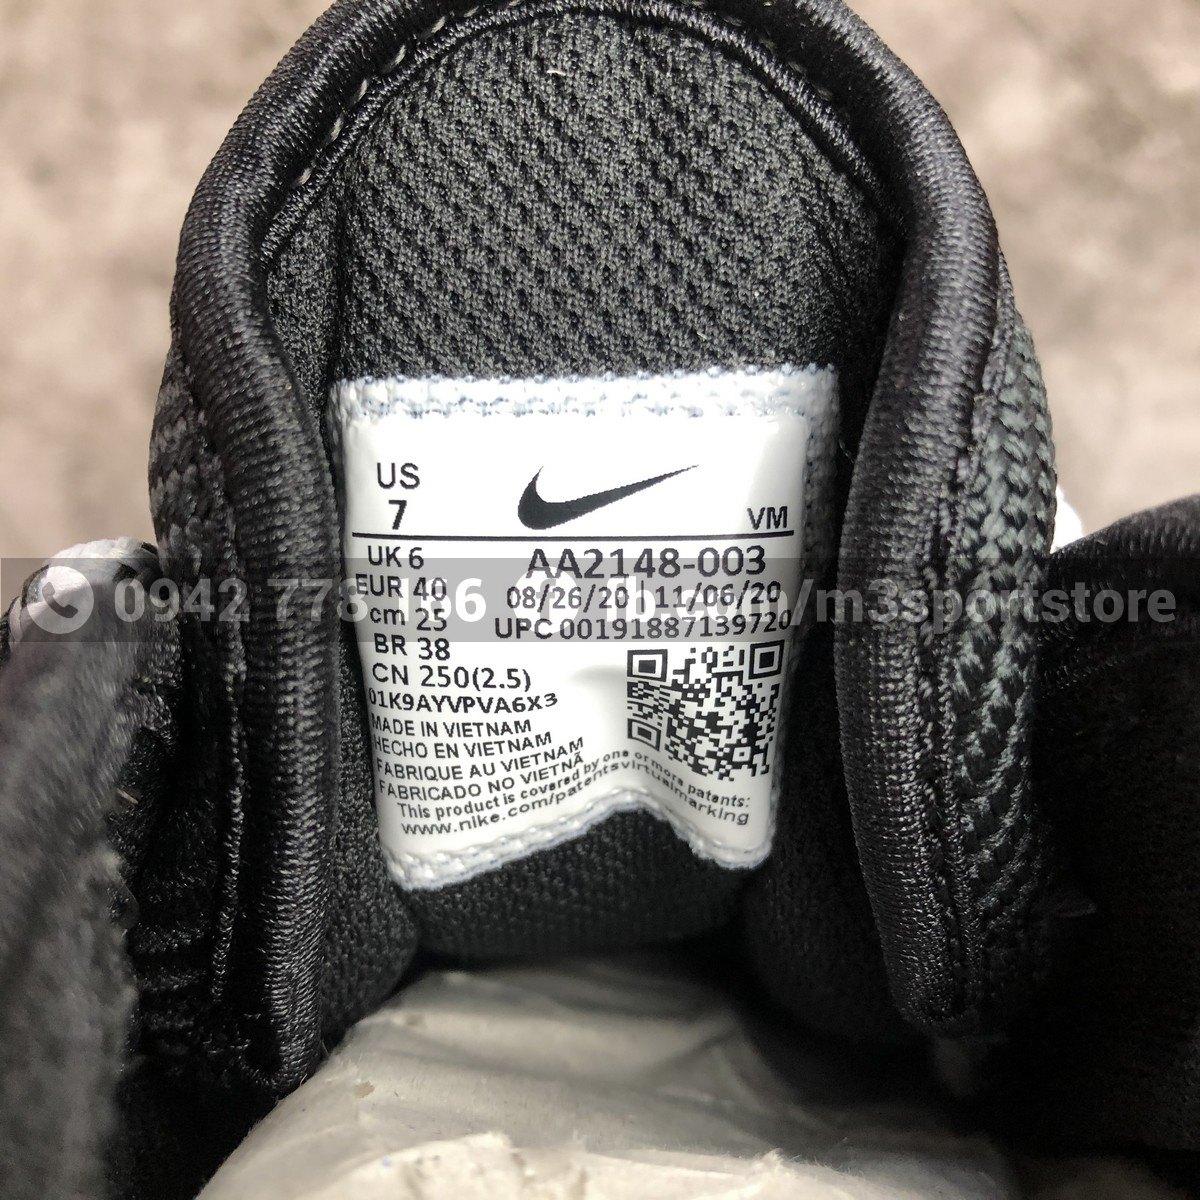 Giày thể thao nam Nike Air Max Axis Premium AA2148-003